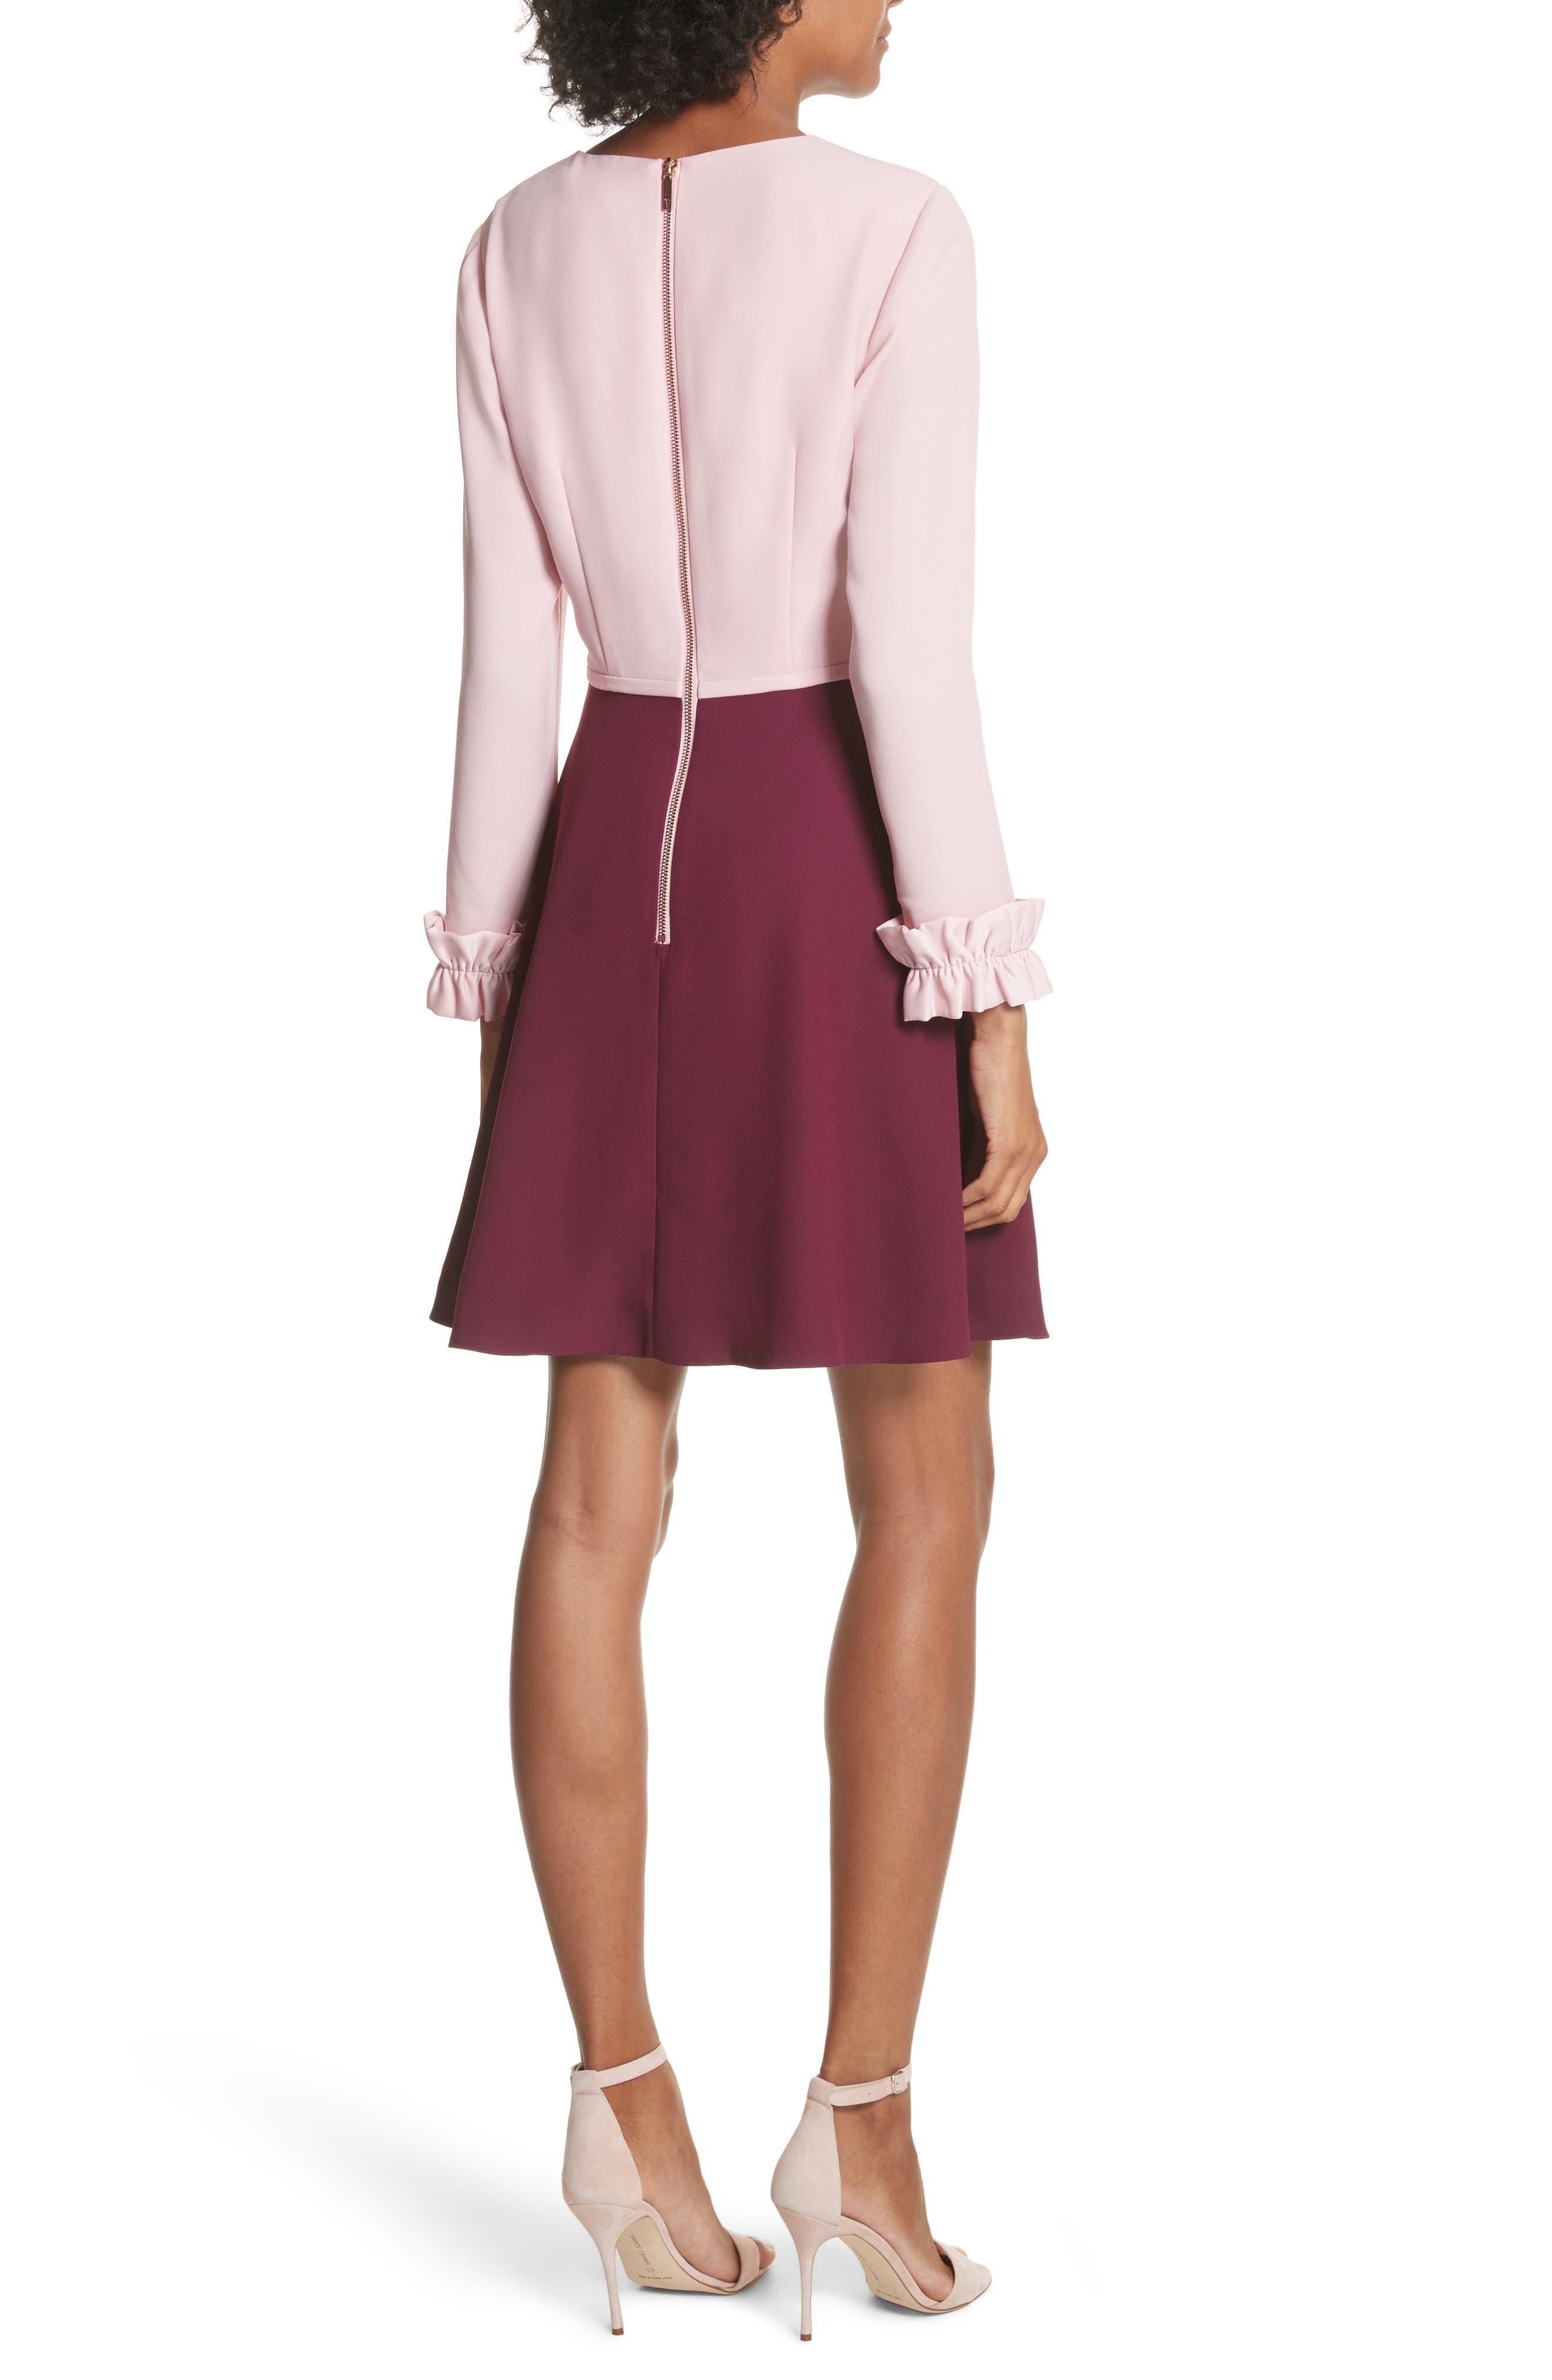 Steyla Ruffle Dress,                             Alternate thumbnail 2, color,                             652